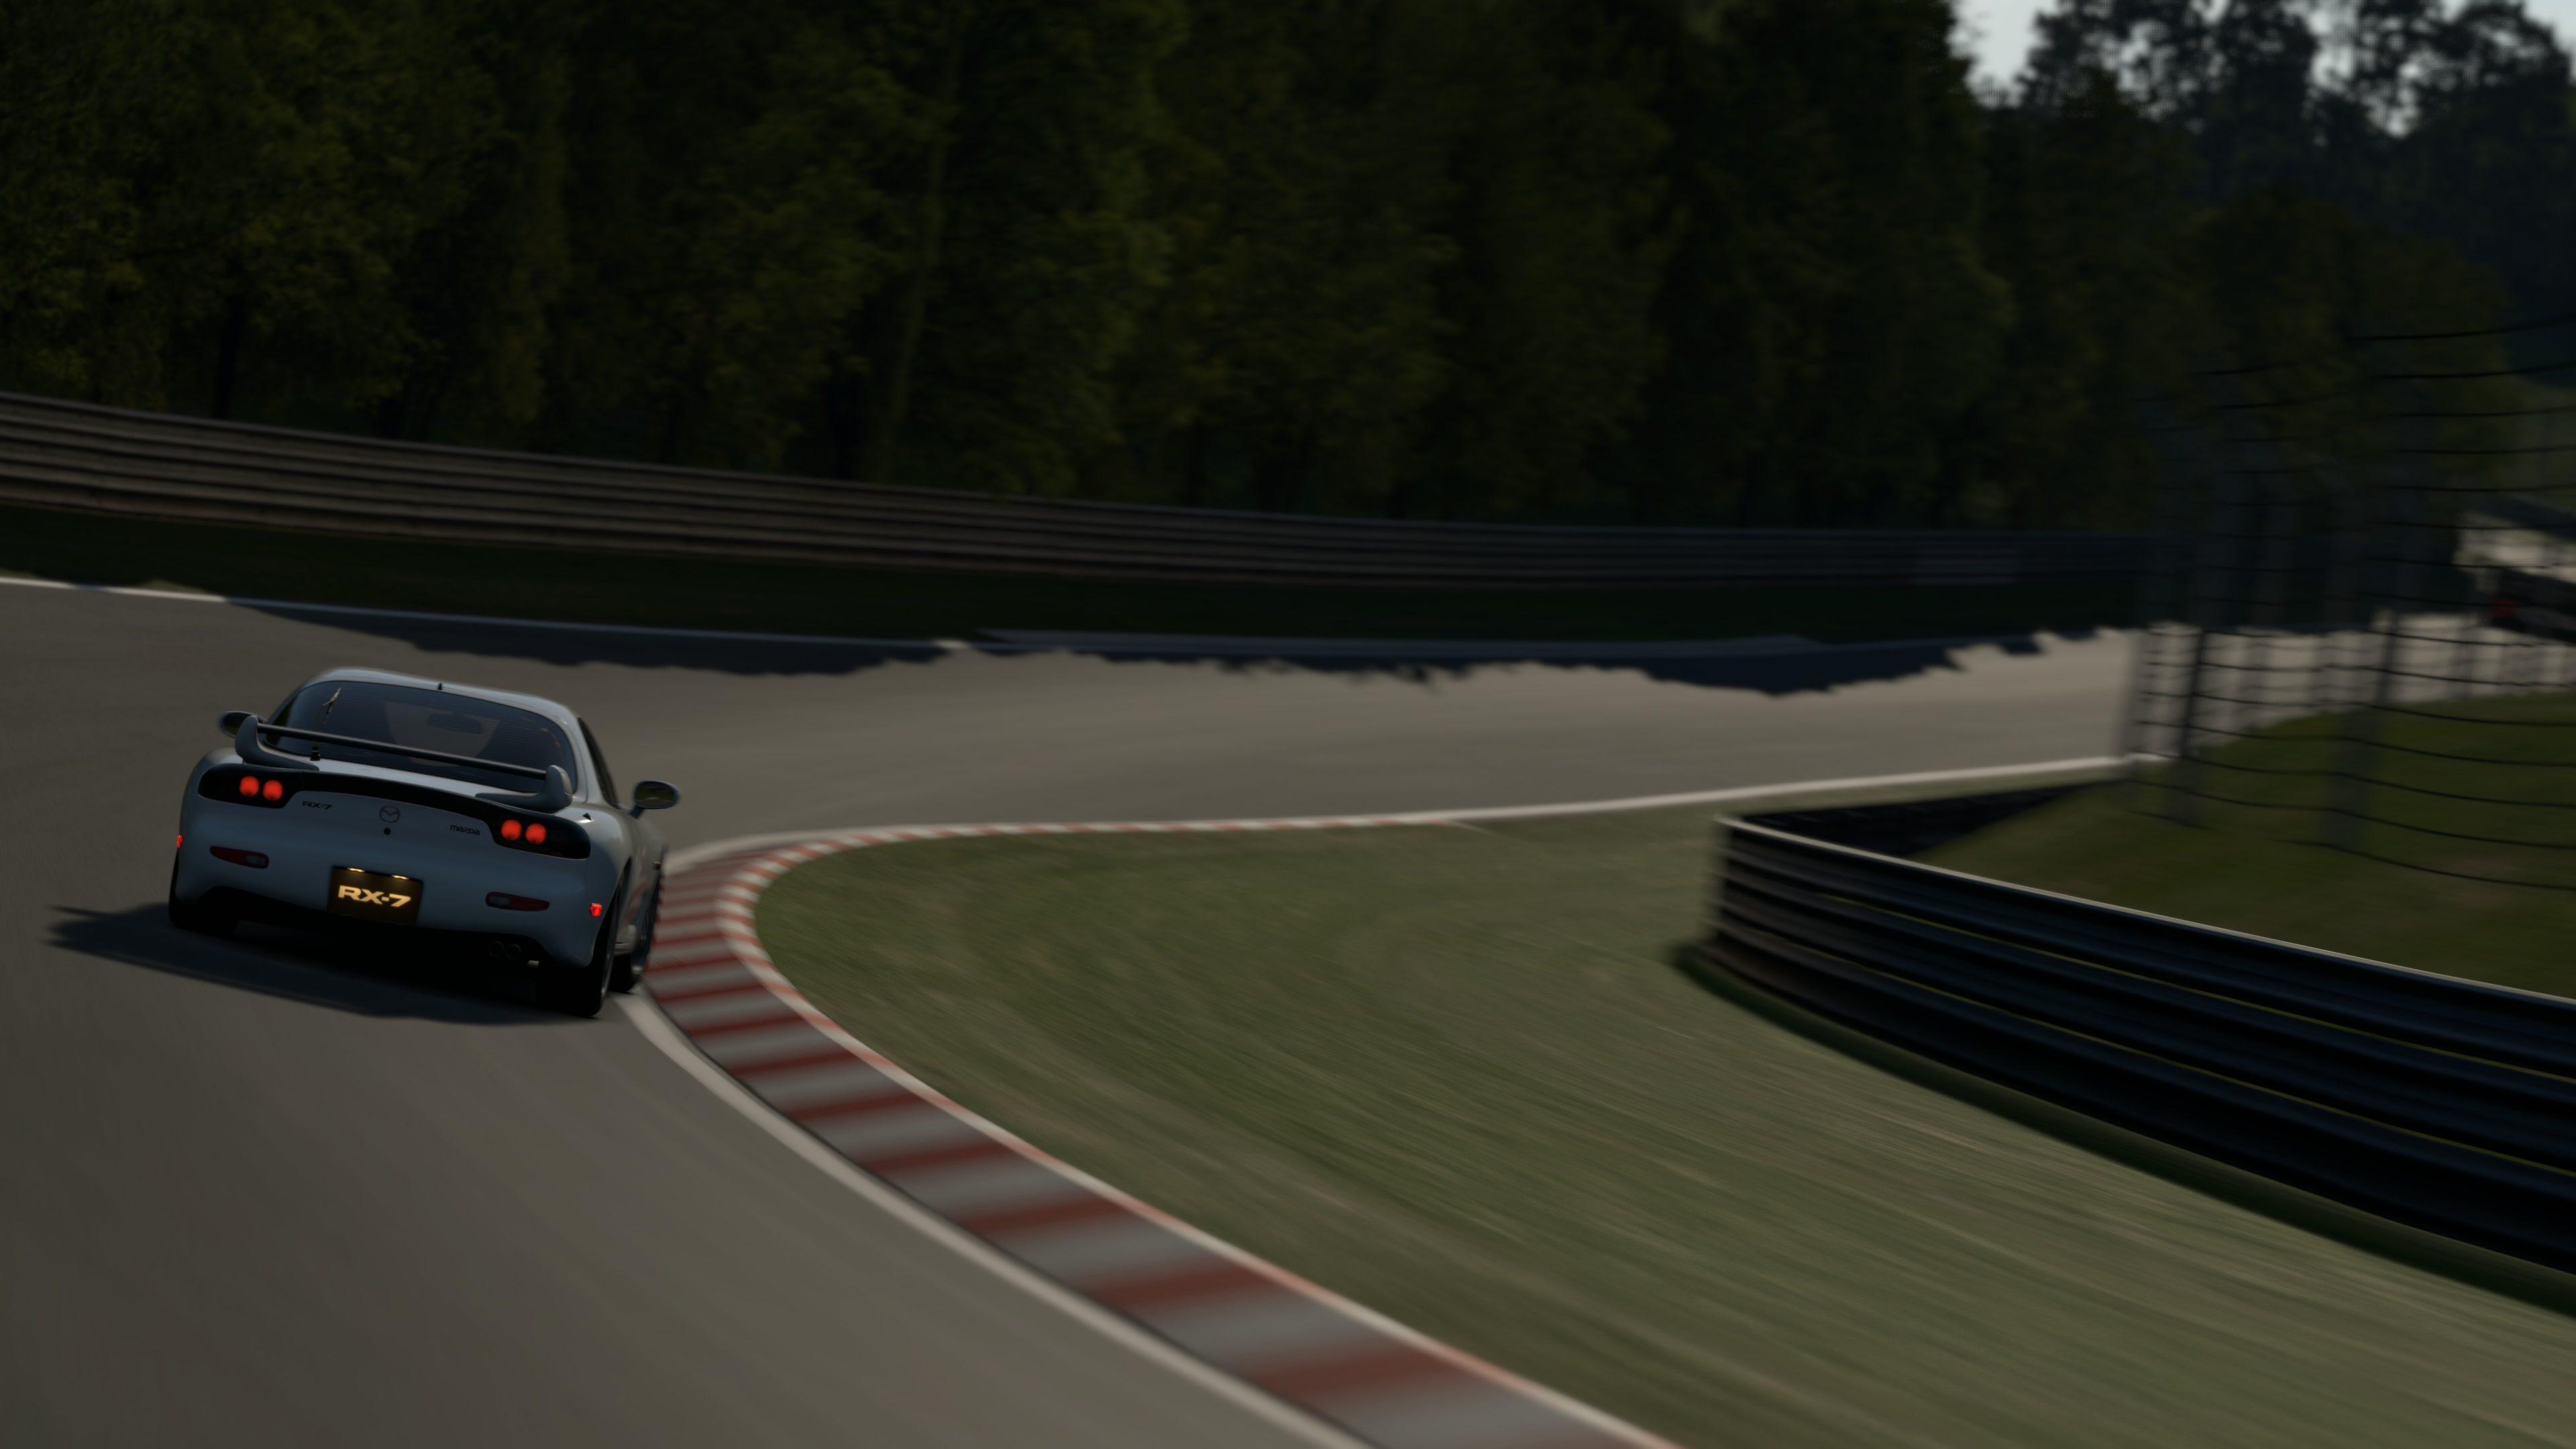 Nürburgring Nordschleife_13.jpg